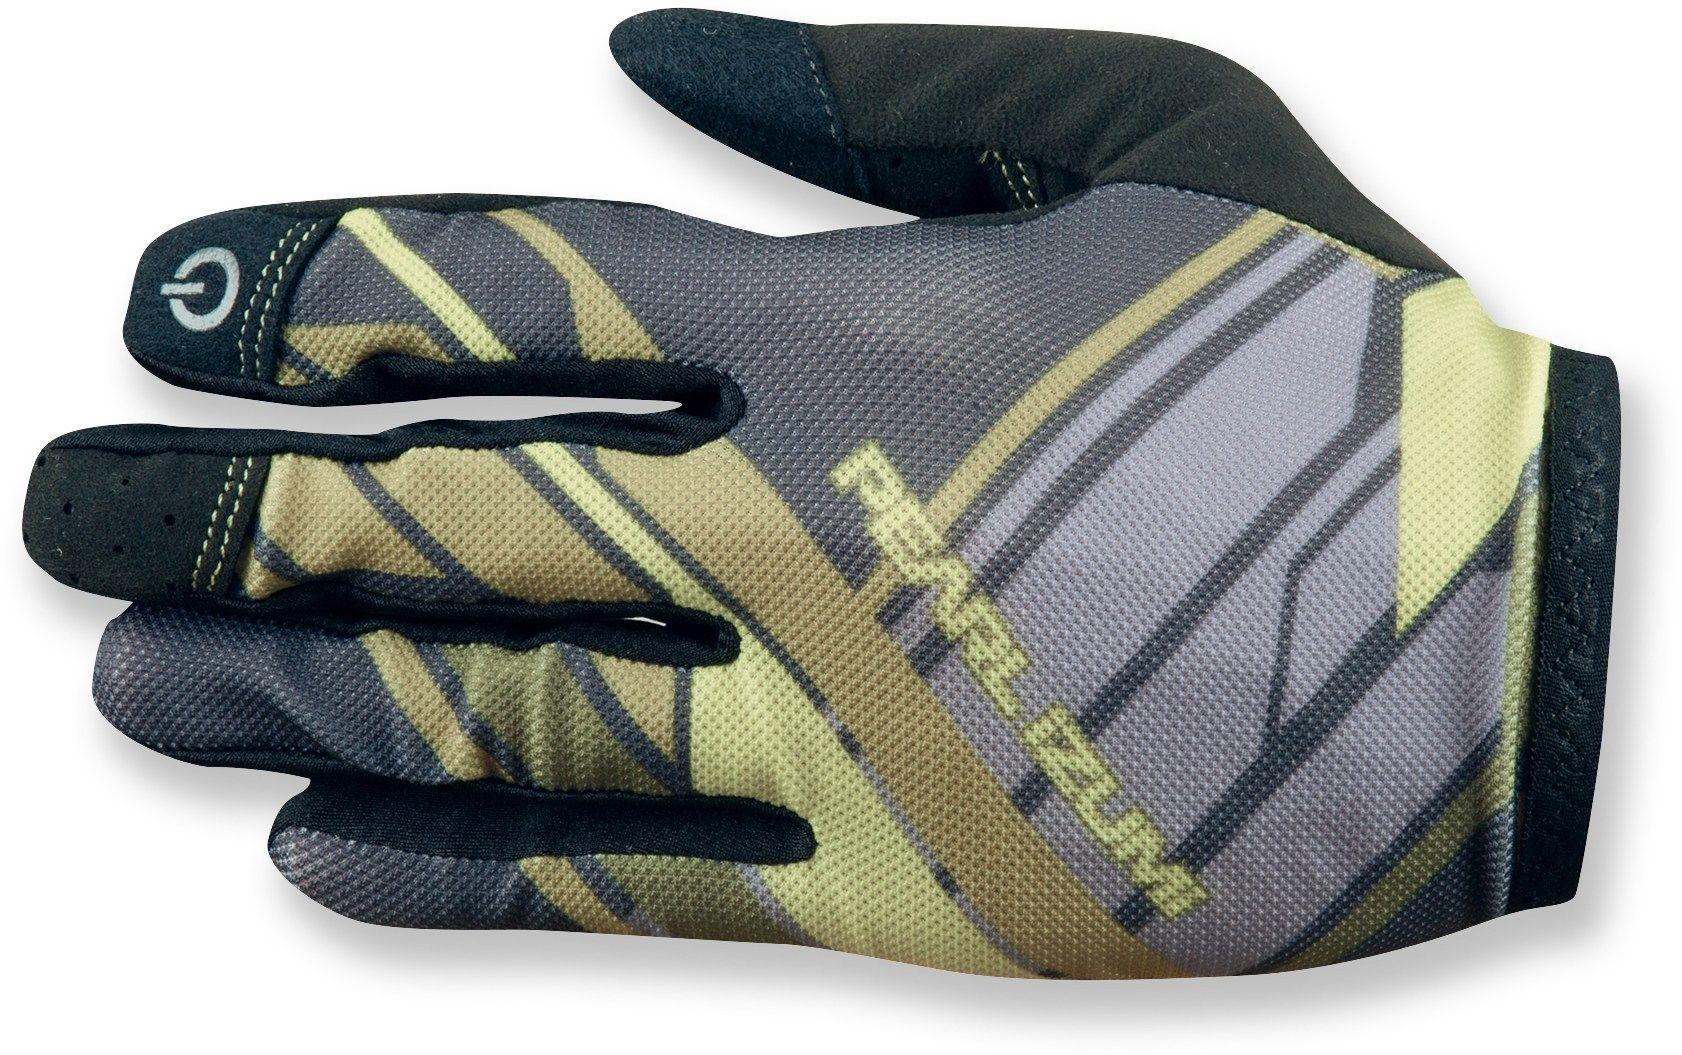 Pearl Izumi Male Divide Bike Gloves - Men's